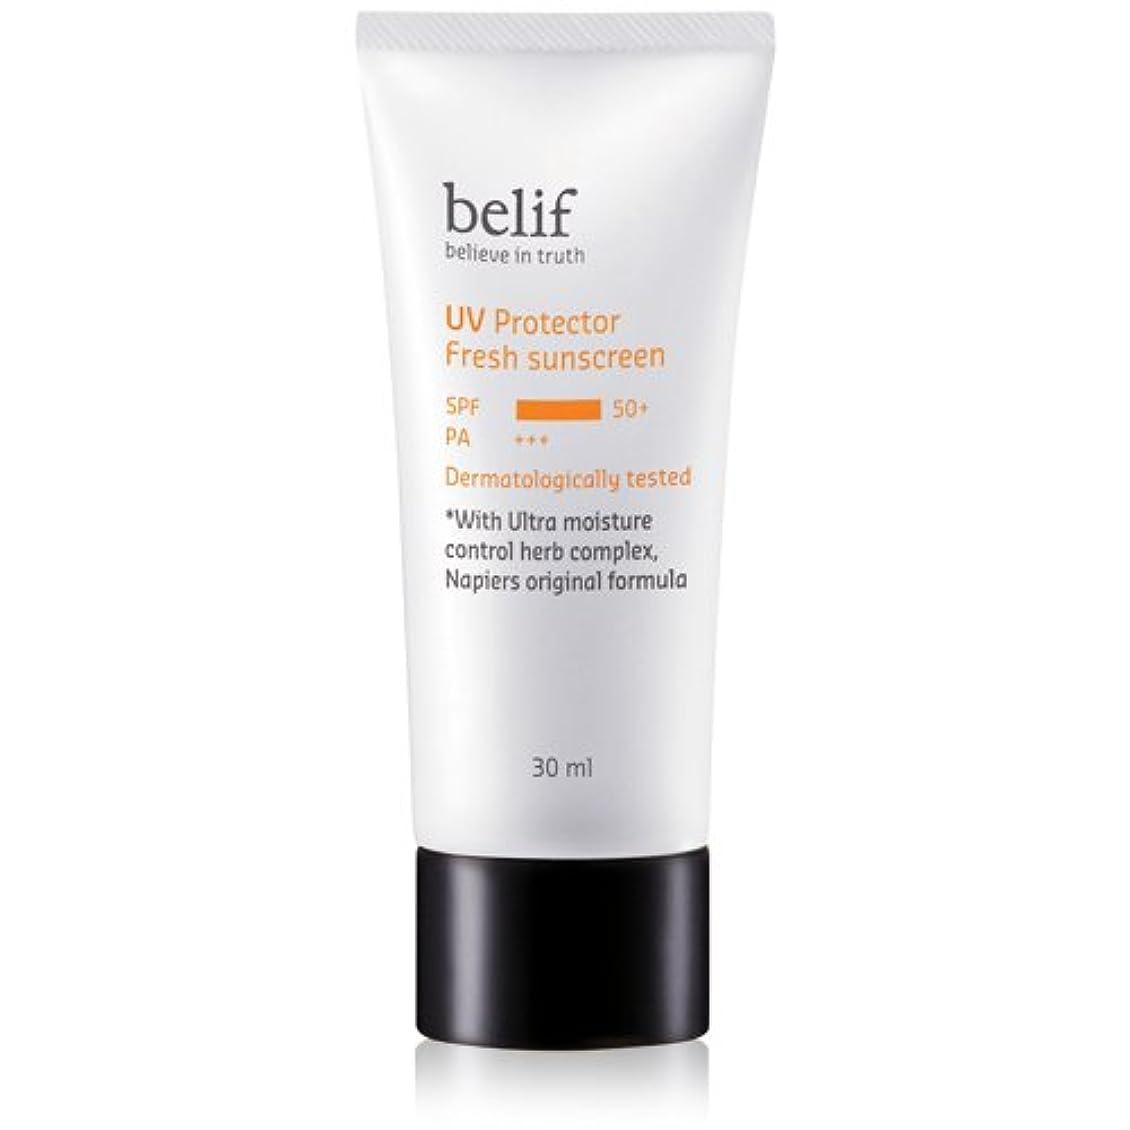 Belif(ビリーフ) UV Protector Fresh sunscreen 30ml/ビリーフUVプロテクターフレッシュサンスクリーン